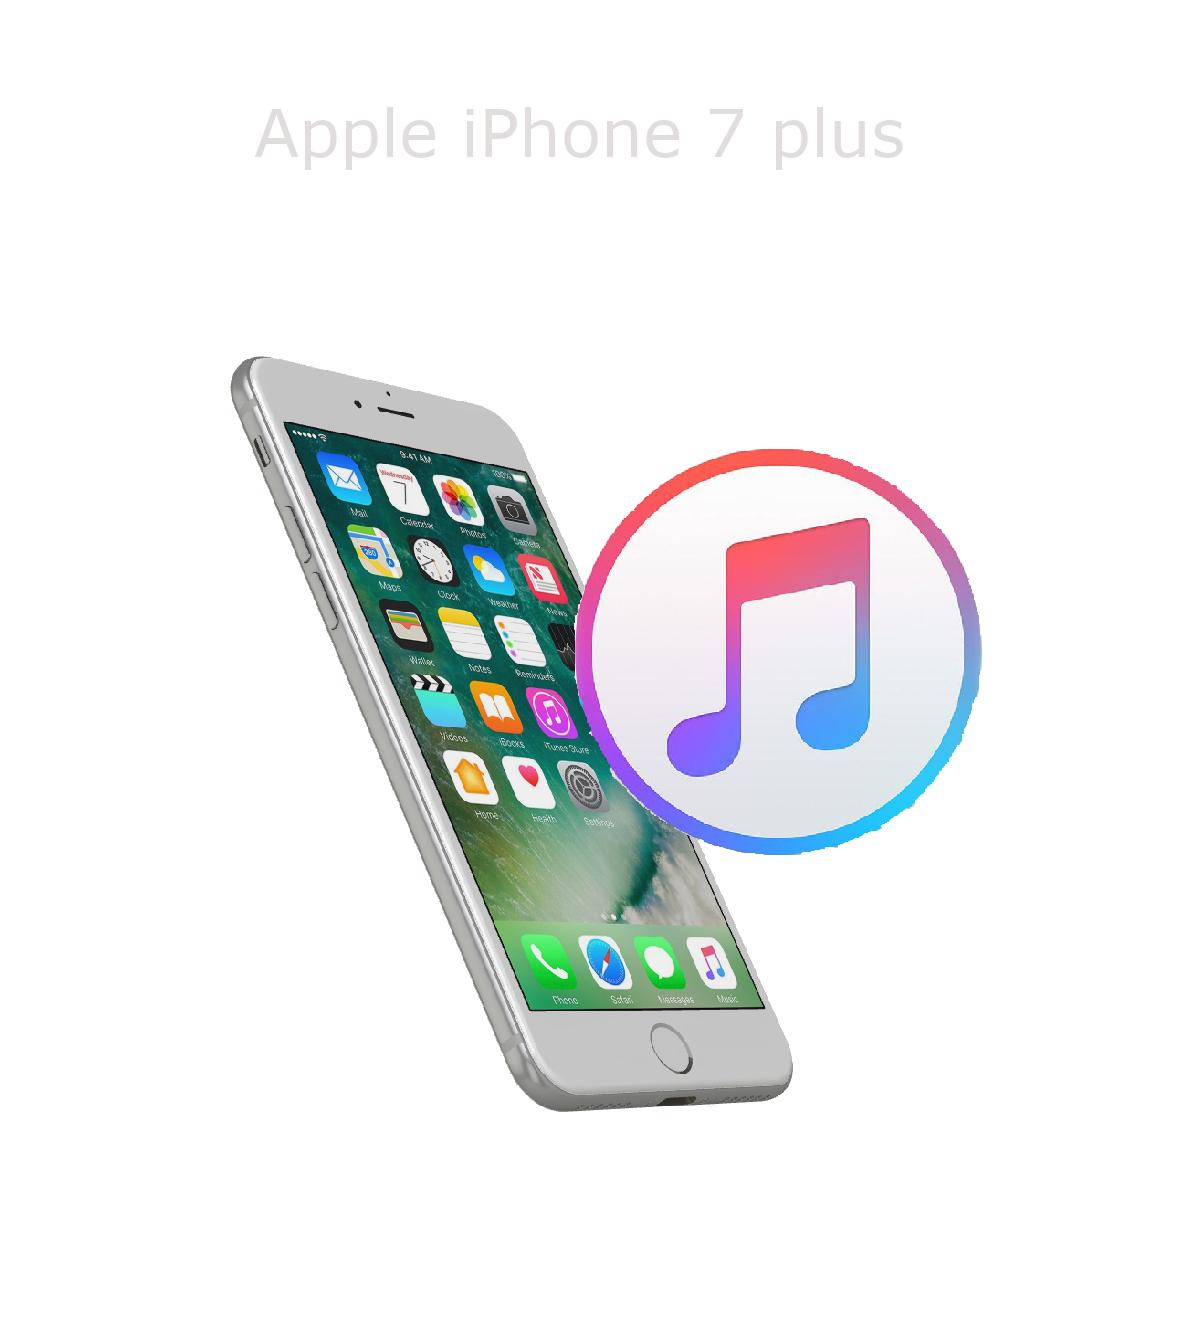 Mjukvara/Återställning iPhone 7 plus